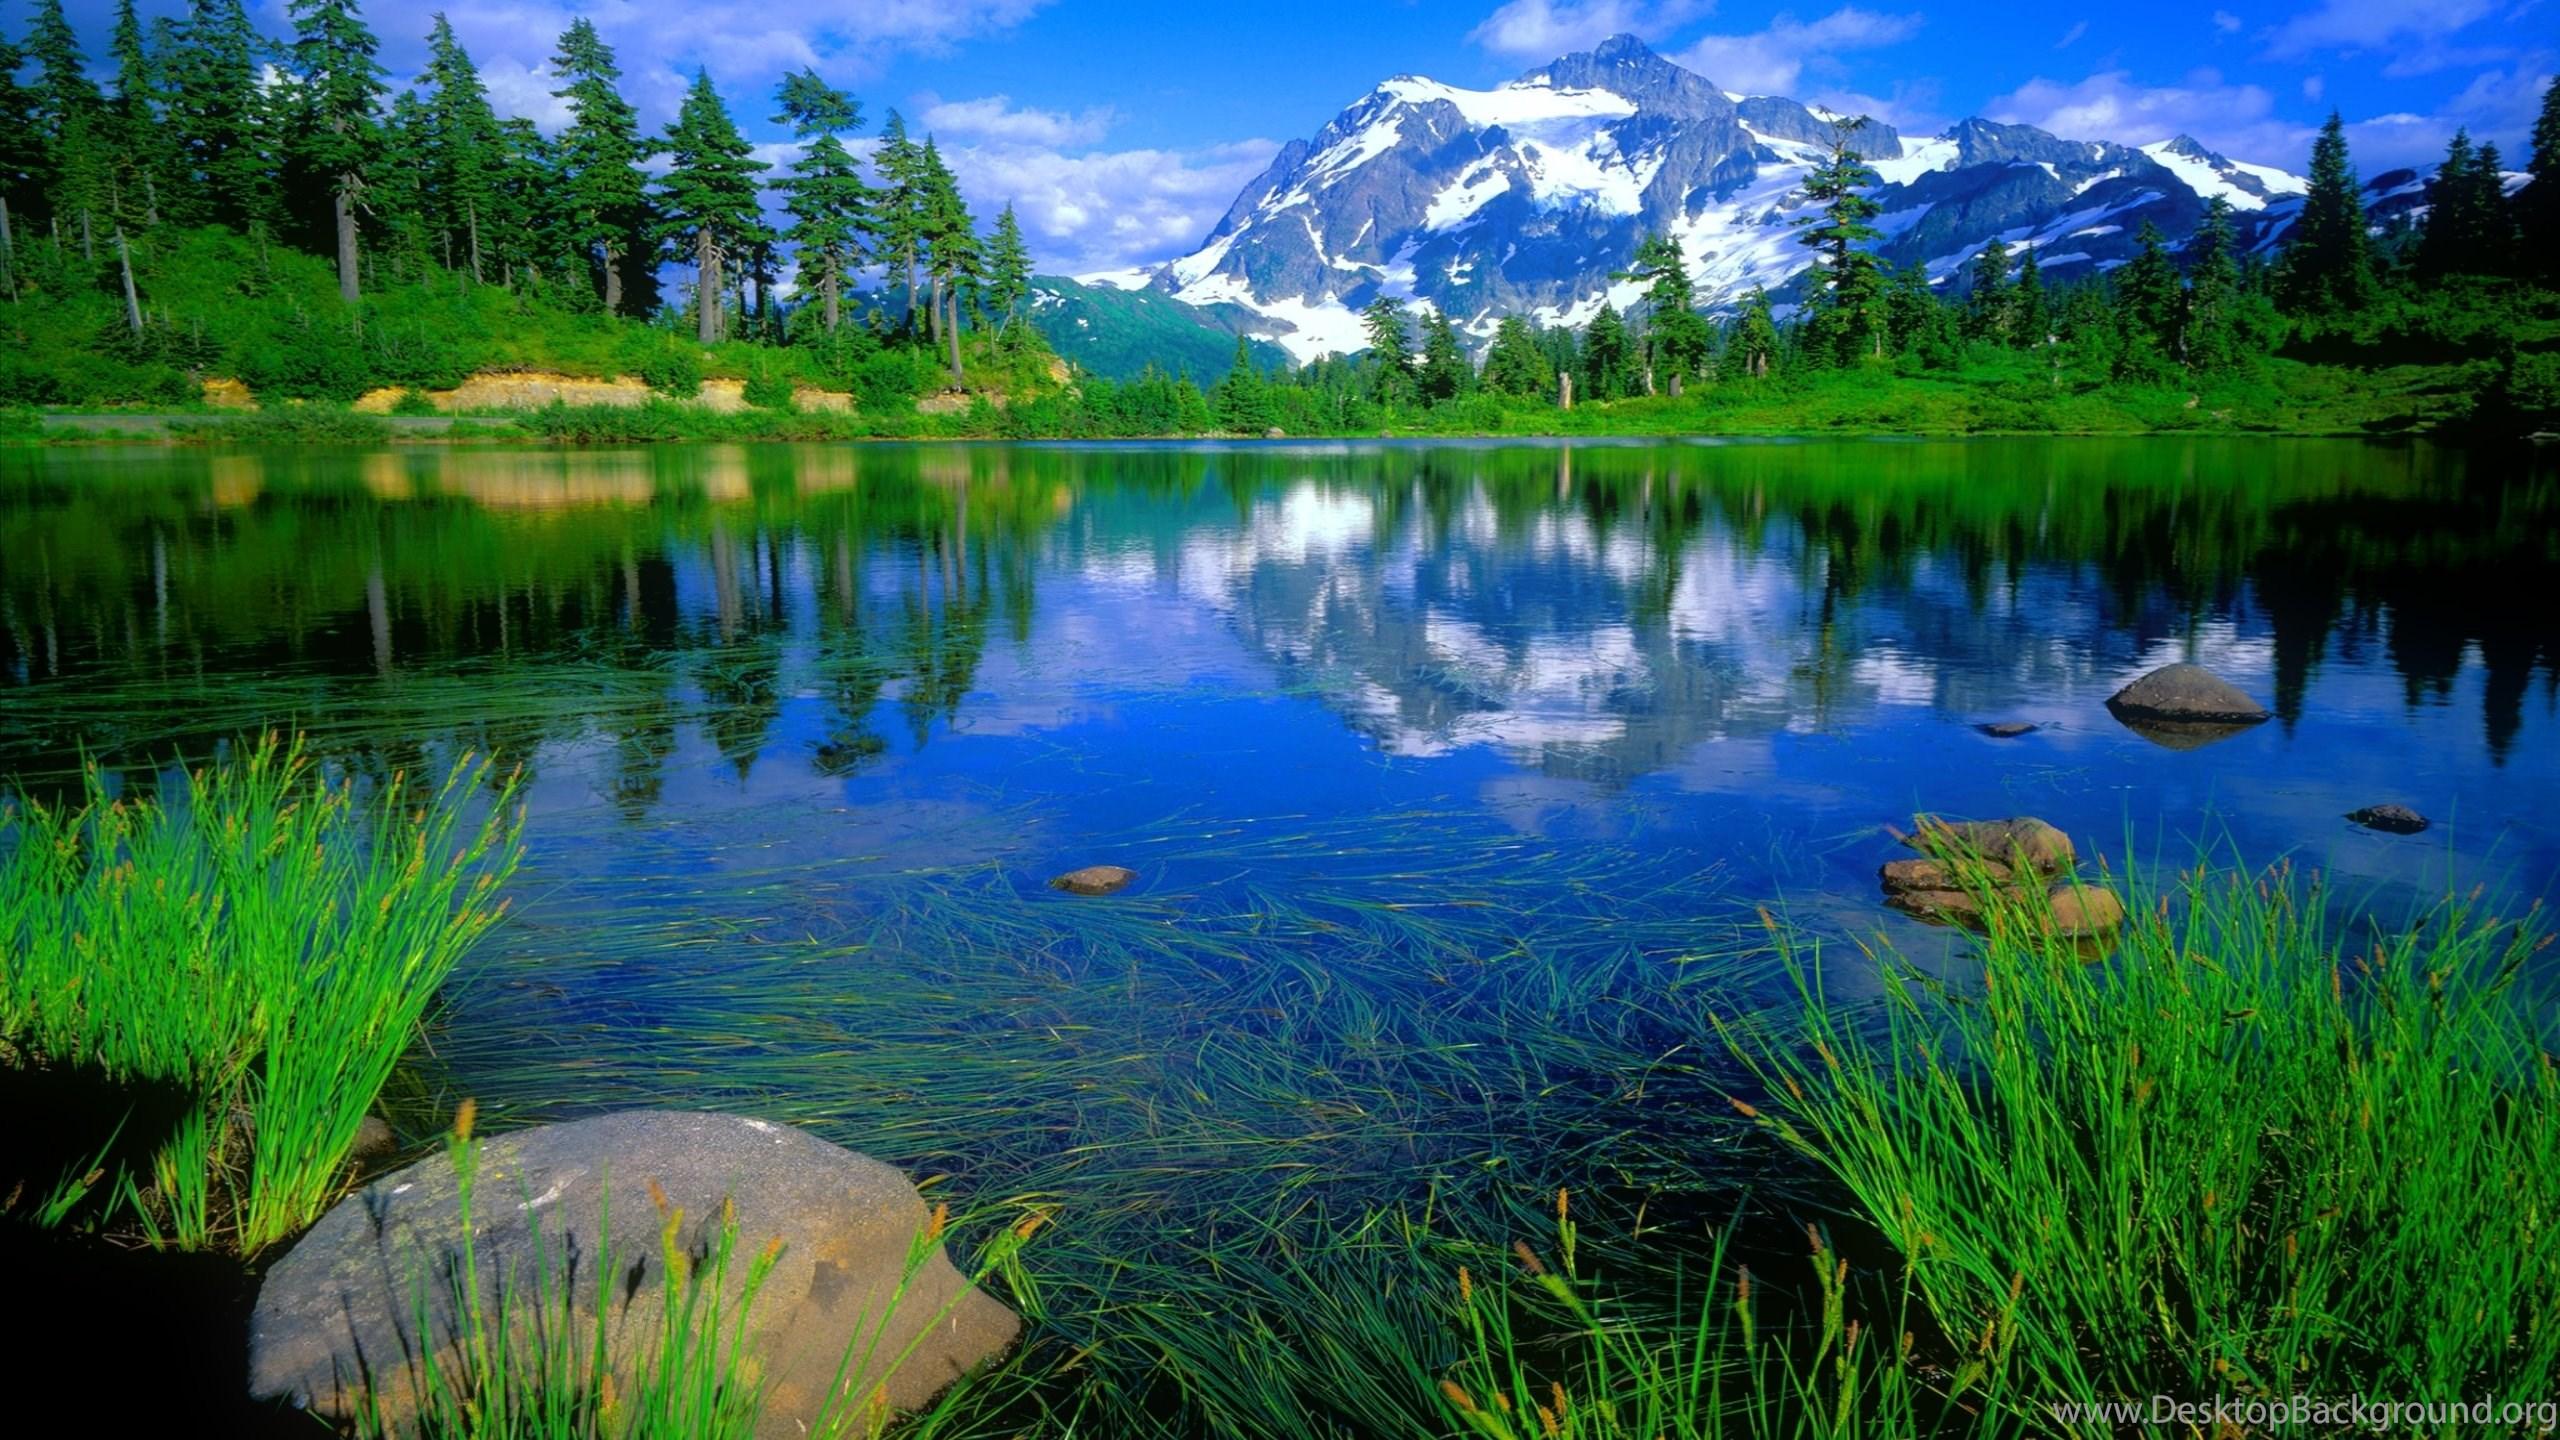 Blue Mountain Lake Wallpapers Desktop Background